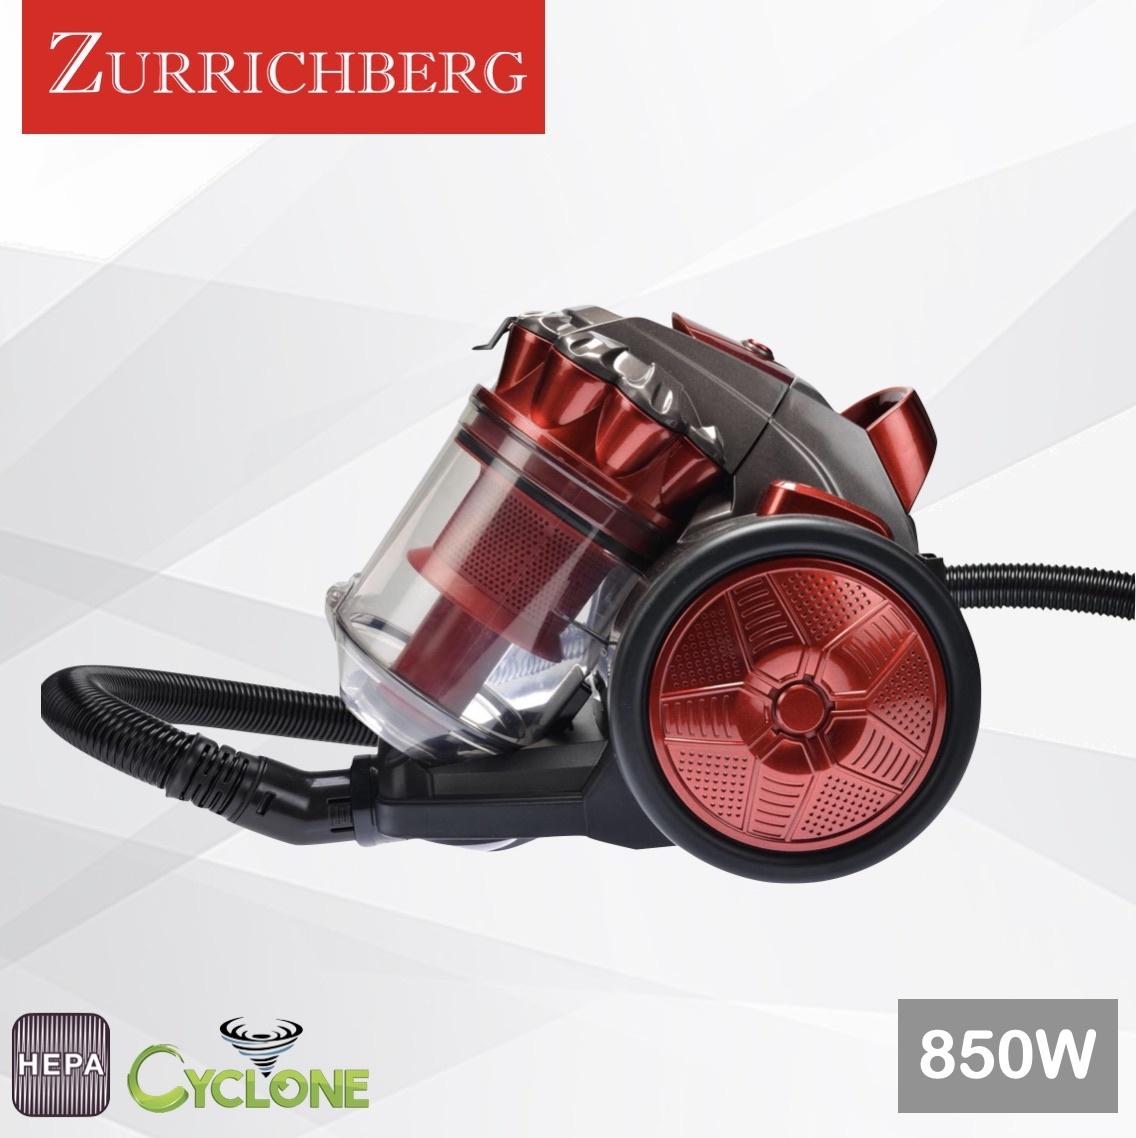 Zurrichberg 850W Cycloon Meertraps Filtersysteem Stofzuiger Zakloos